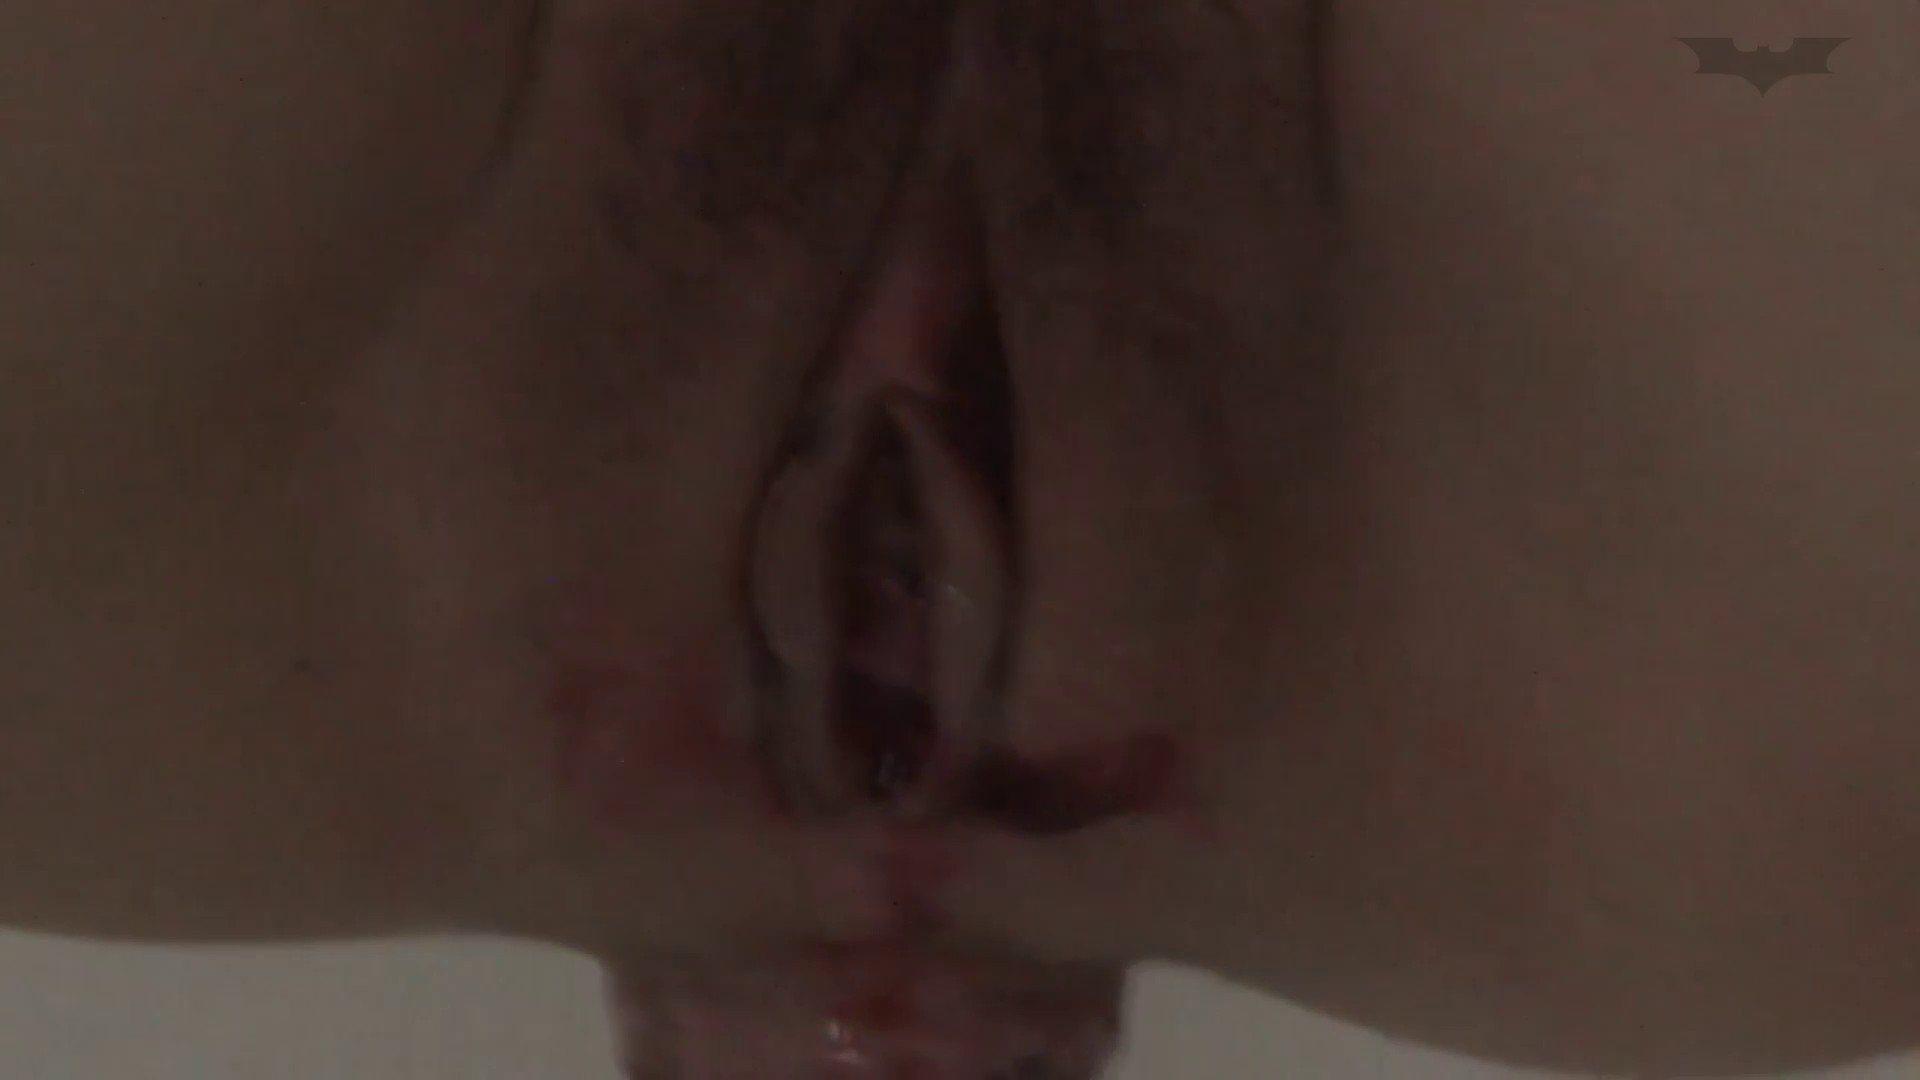 JD盗撮 美女の洗面所の秘密 Vol.57 トイレのぞき AV動画キャプチャ 110画像 29